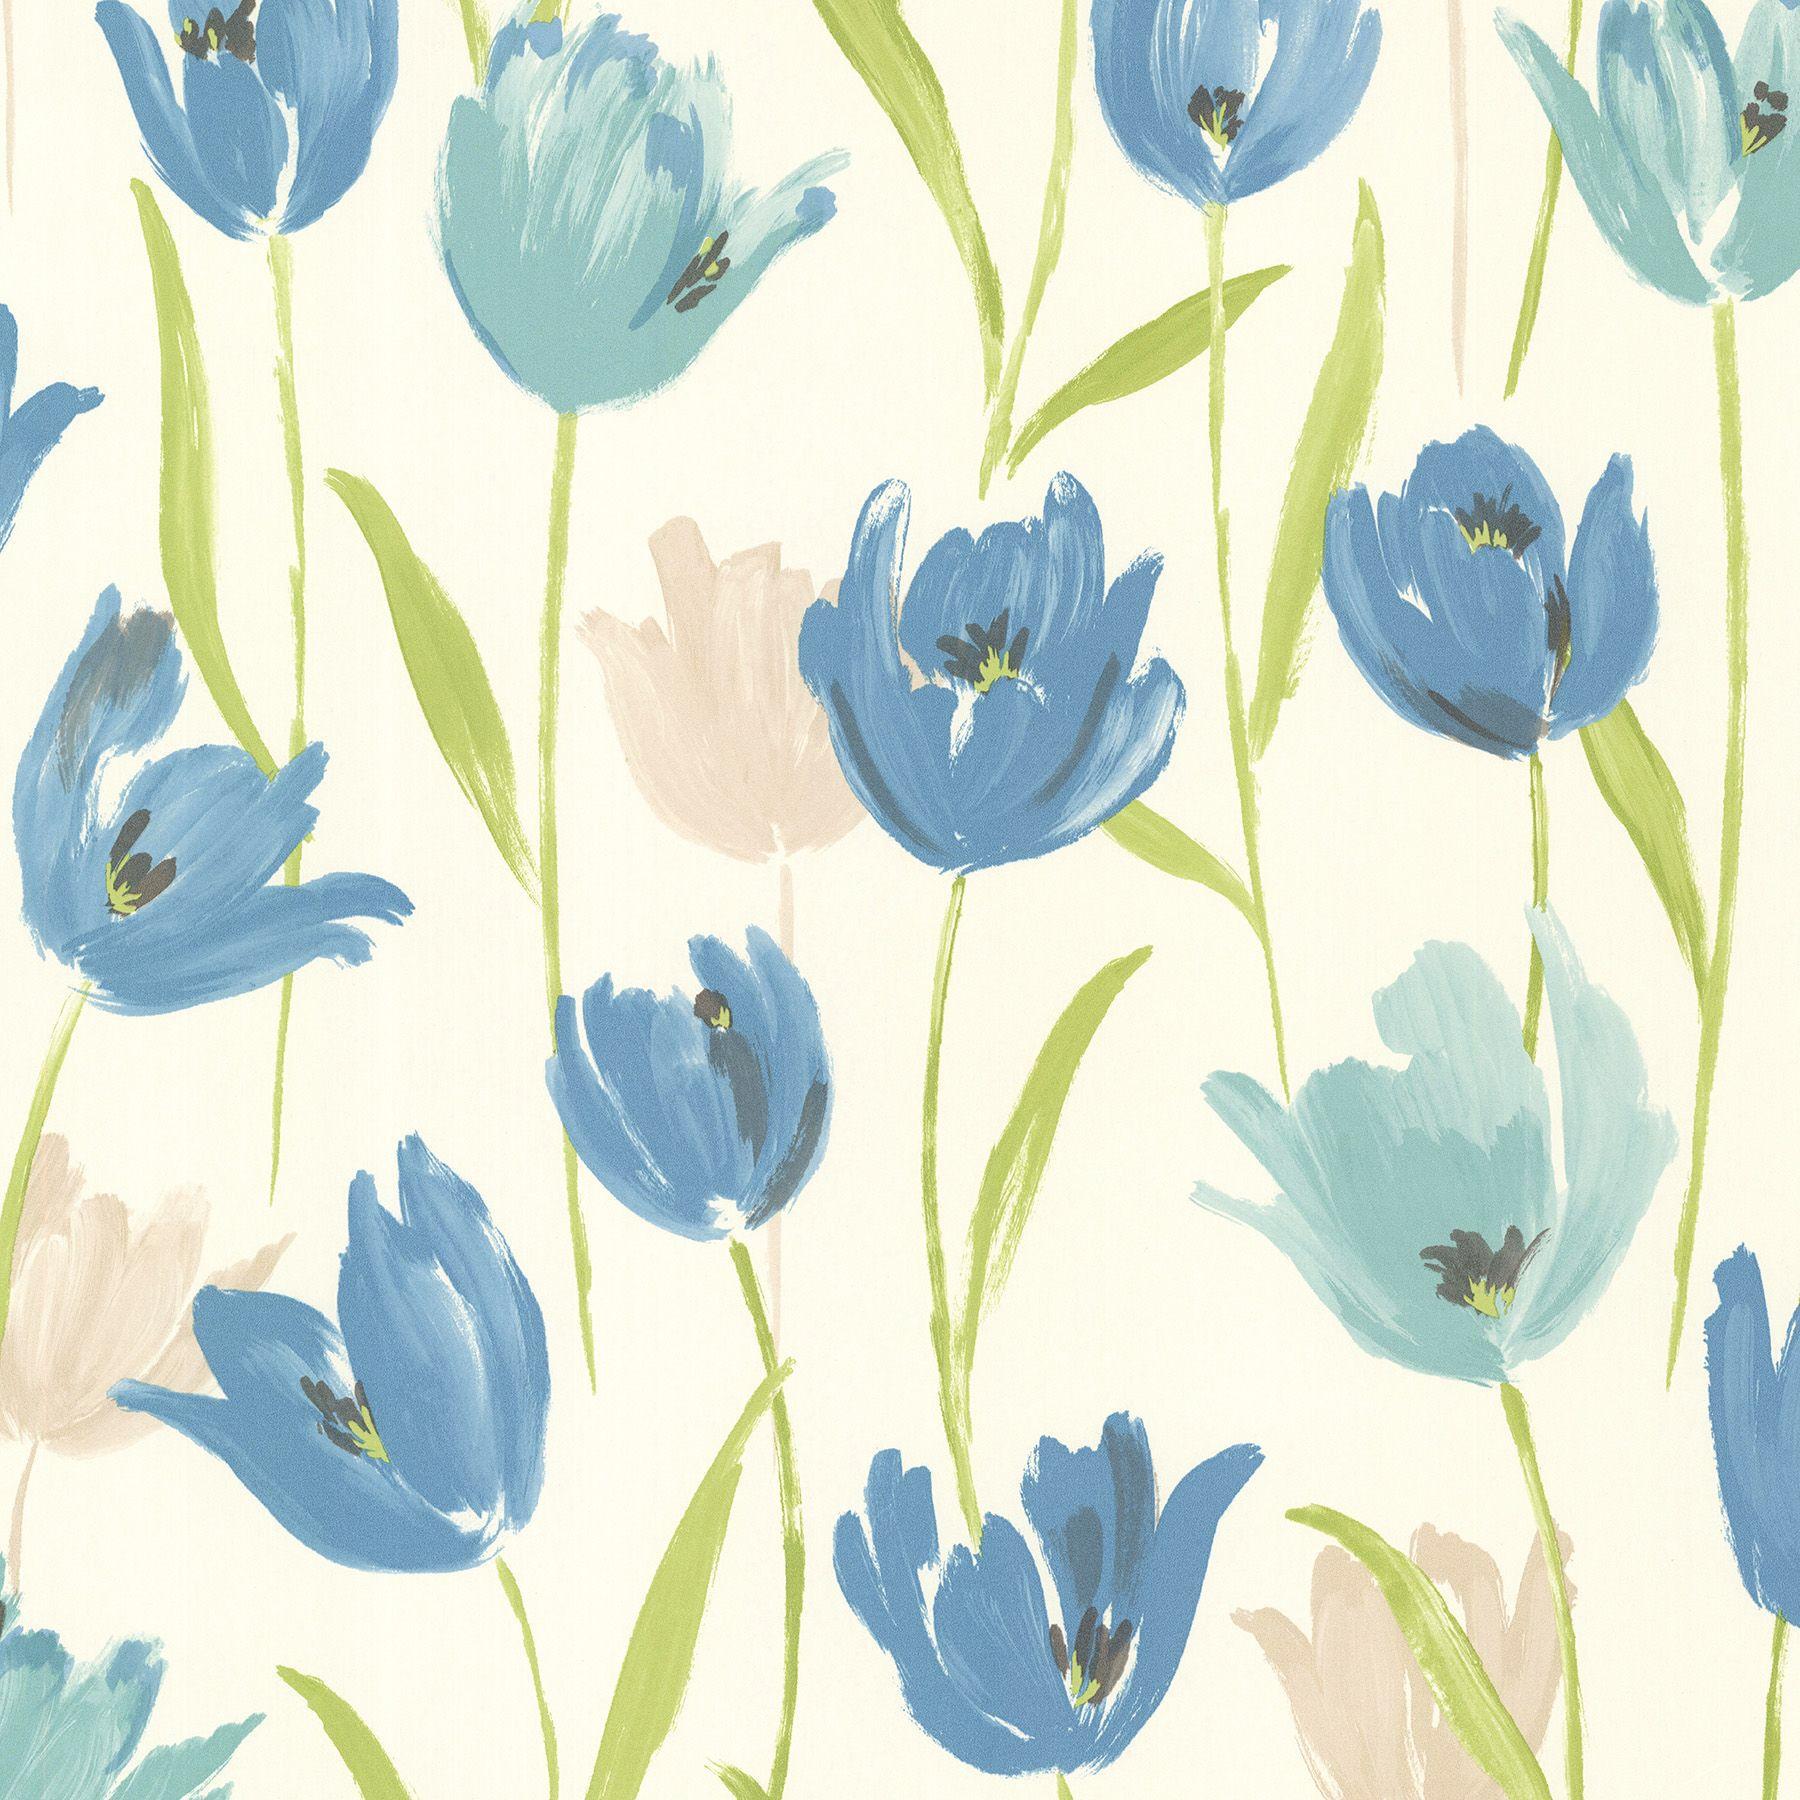 Kitchen & Bath Resource III Finch Tulips 33\' x 20.5\